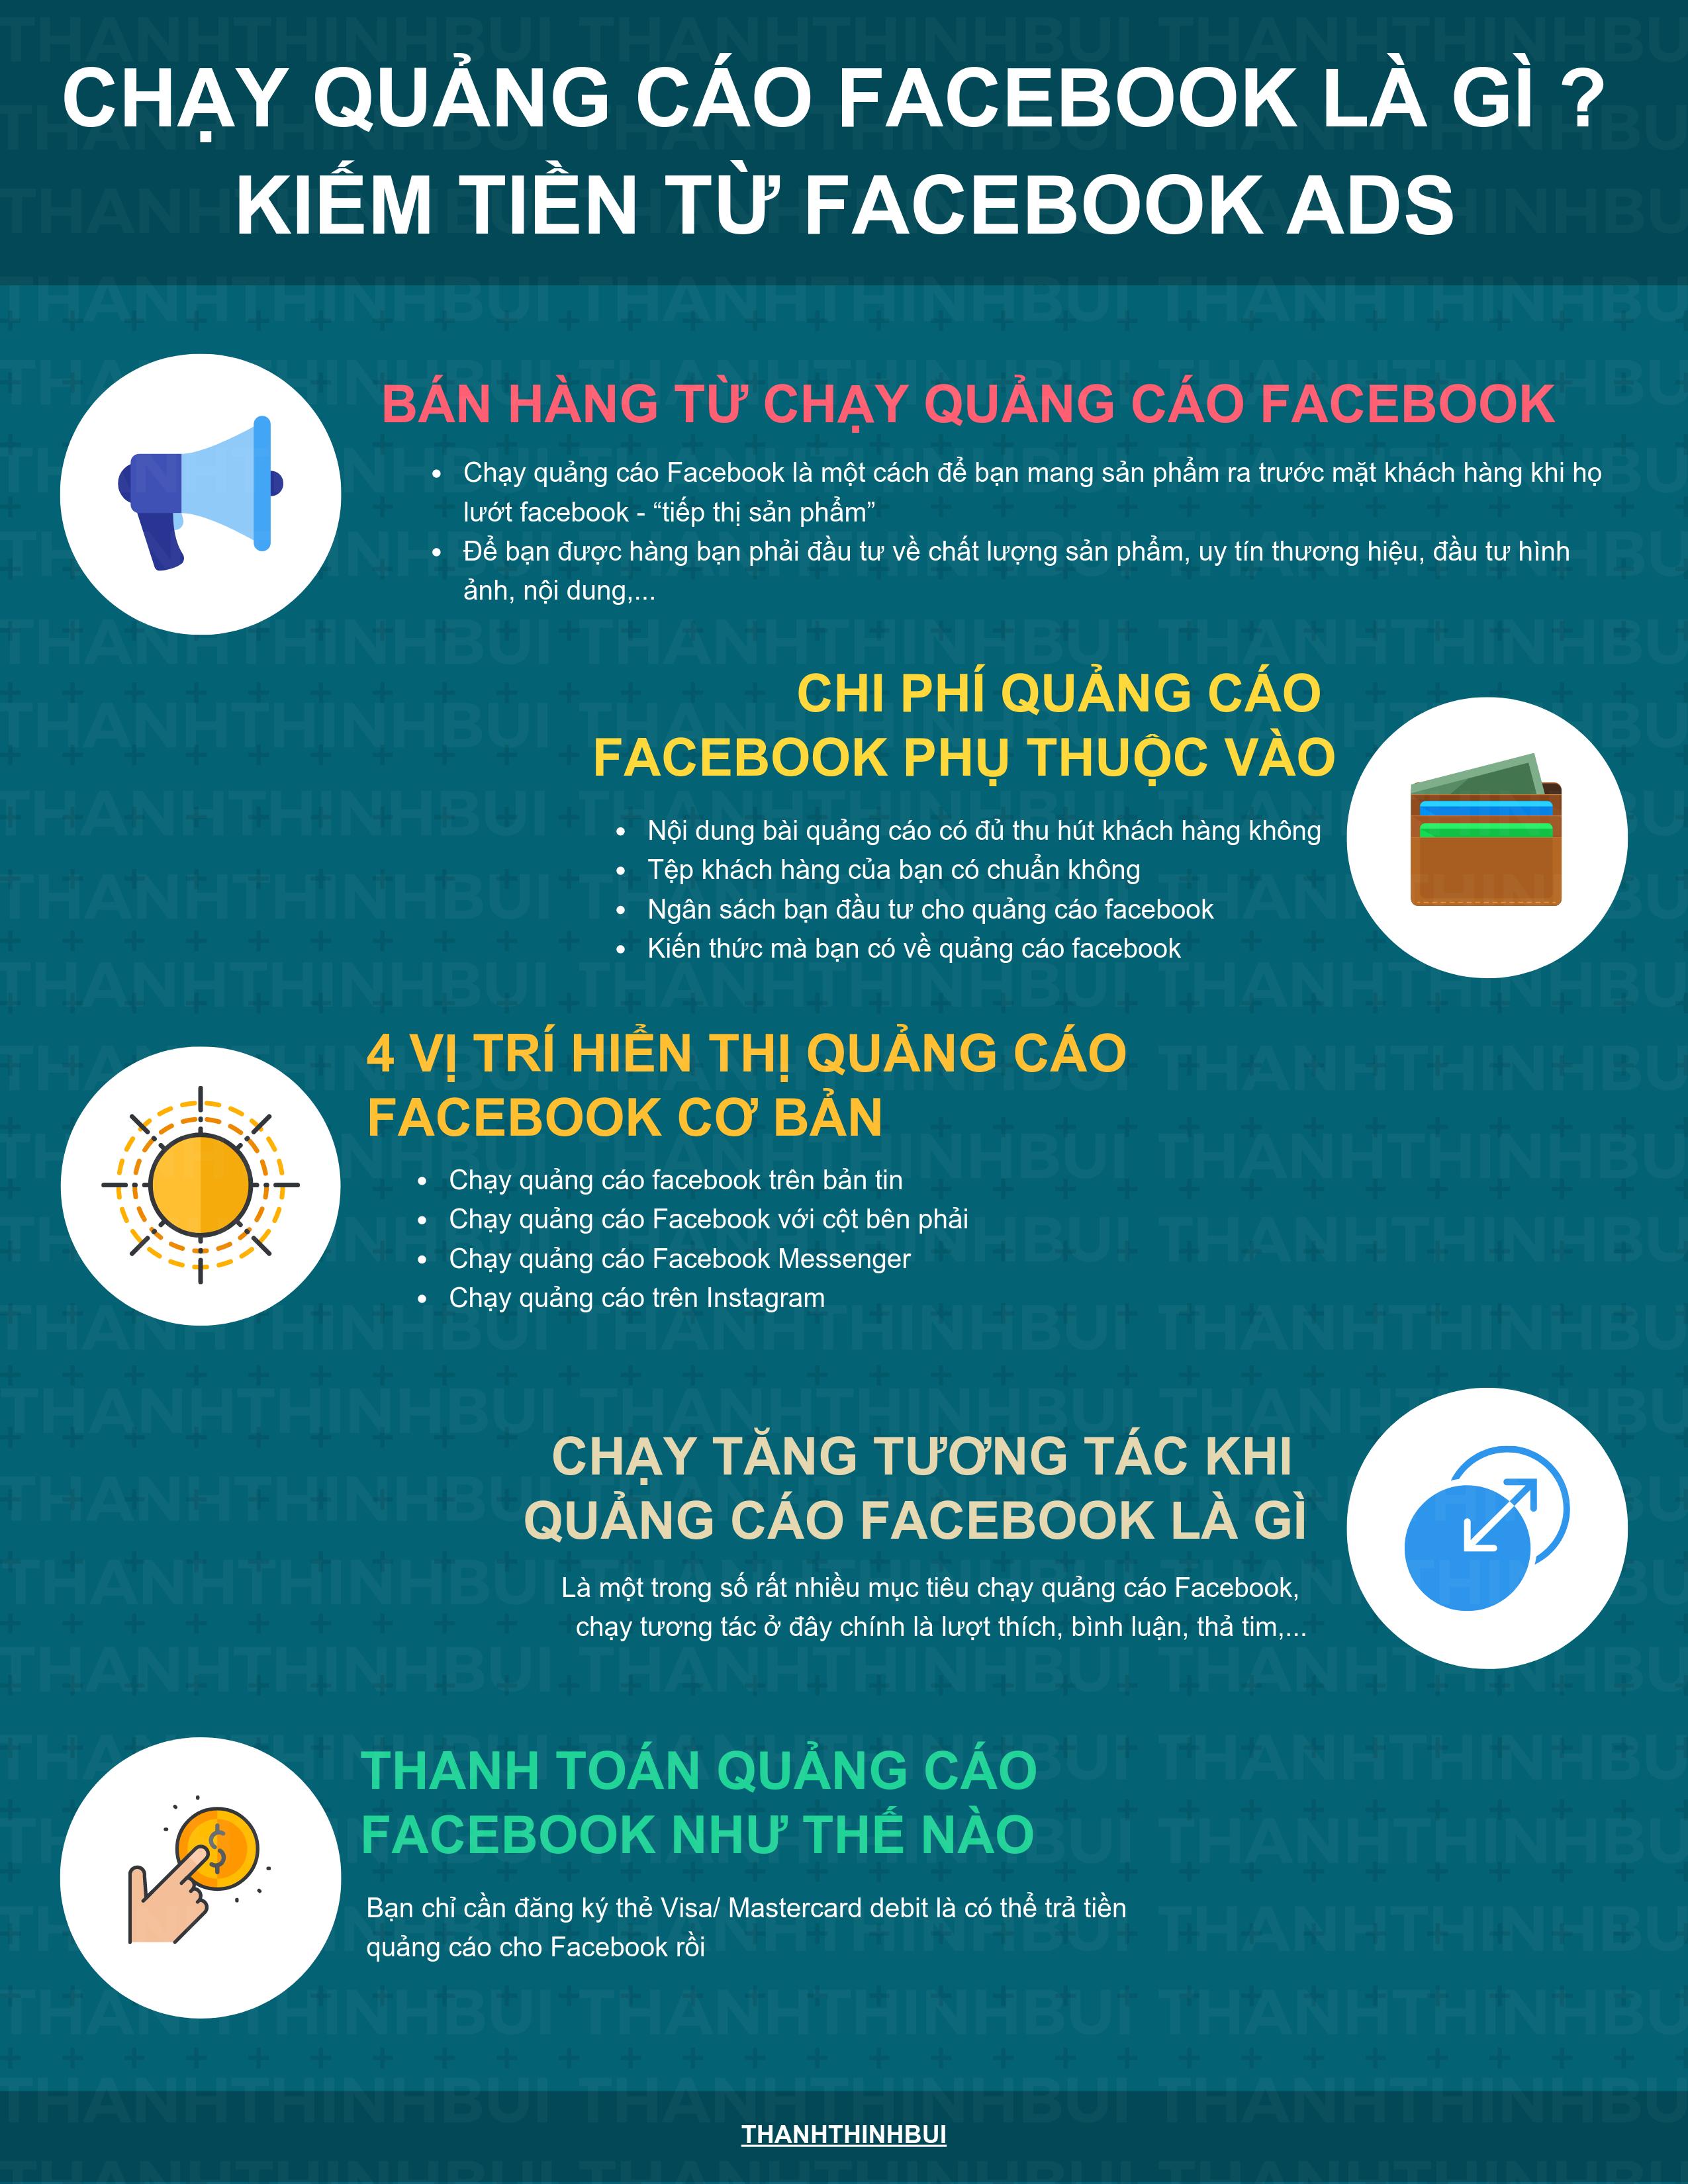 chay-quang-cao-facebook-la-gi-kiem-tien-tu-facebook-ads